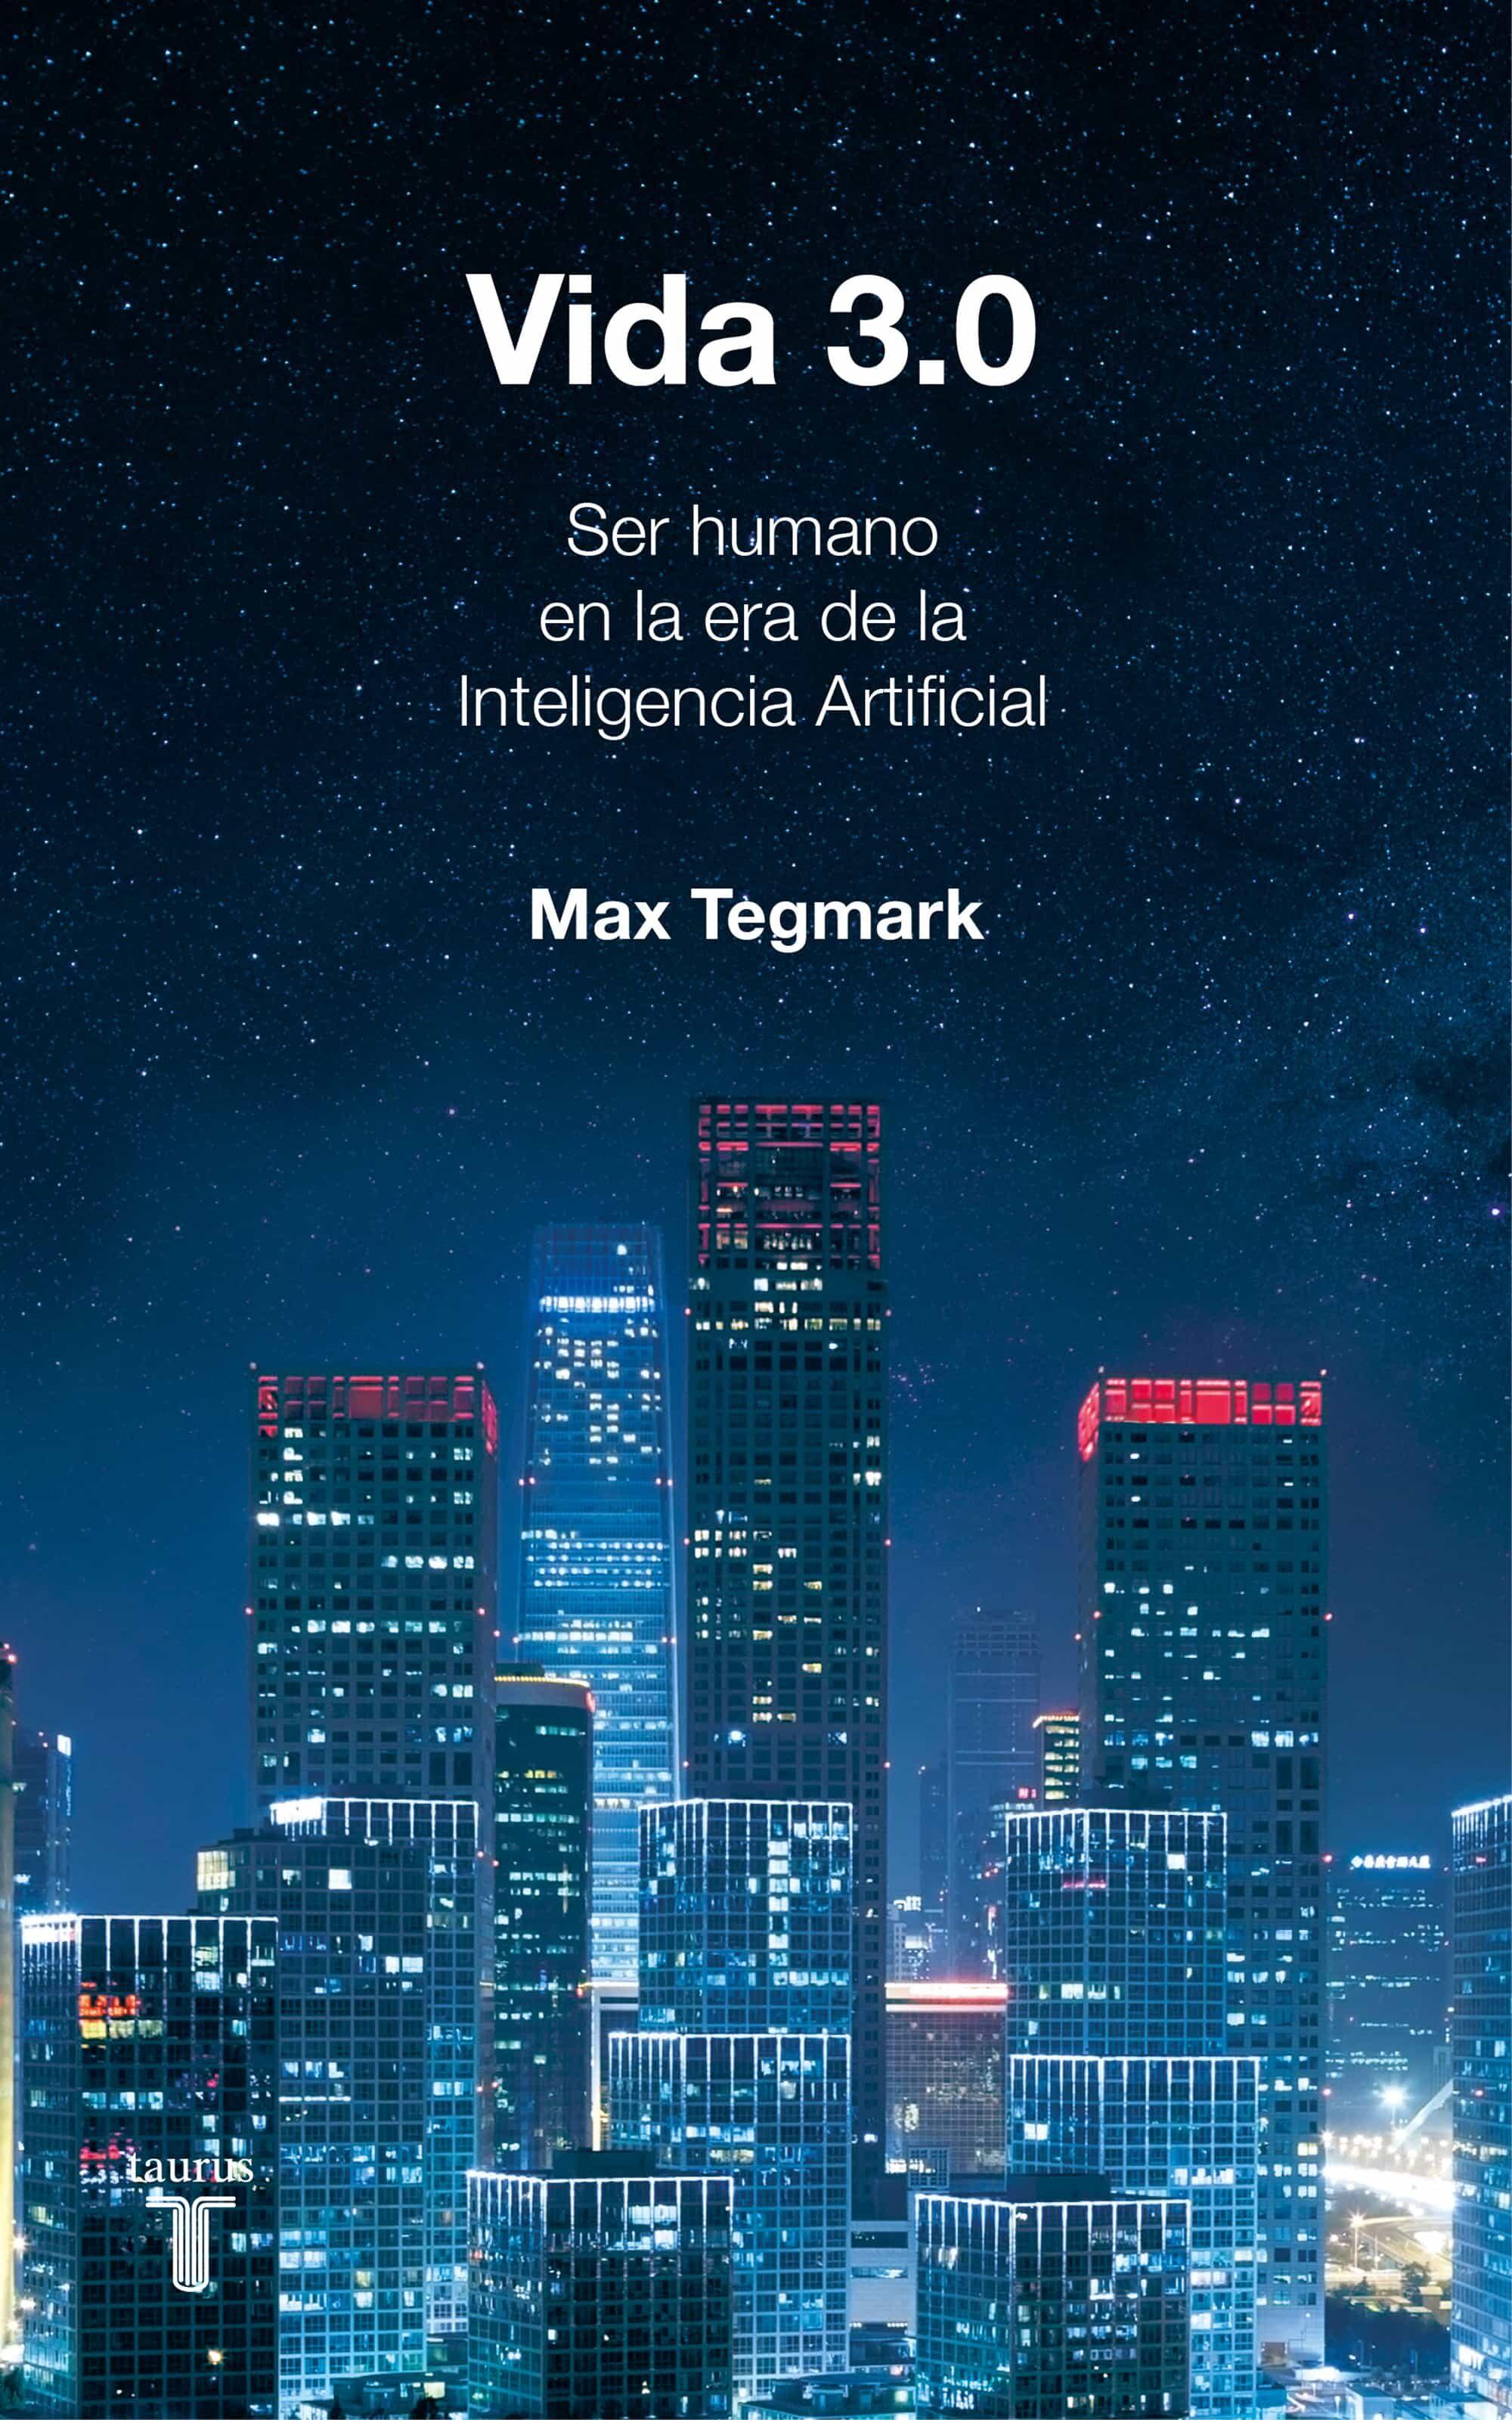 vida 3.0-max tegmark-9788430619627